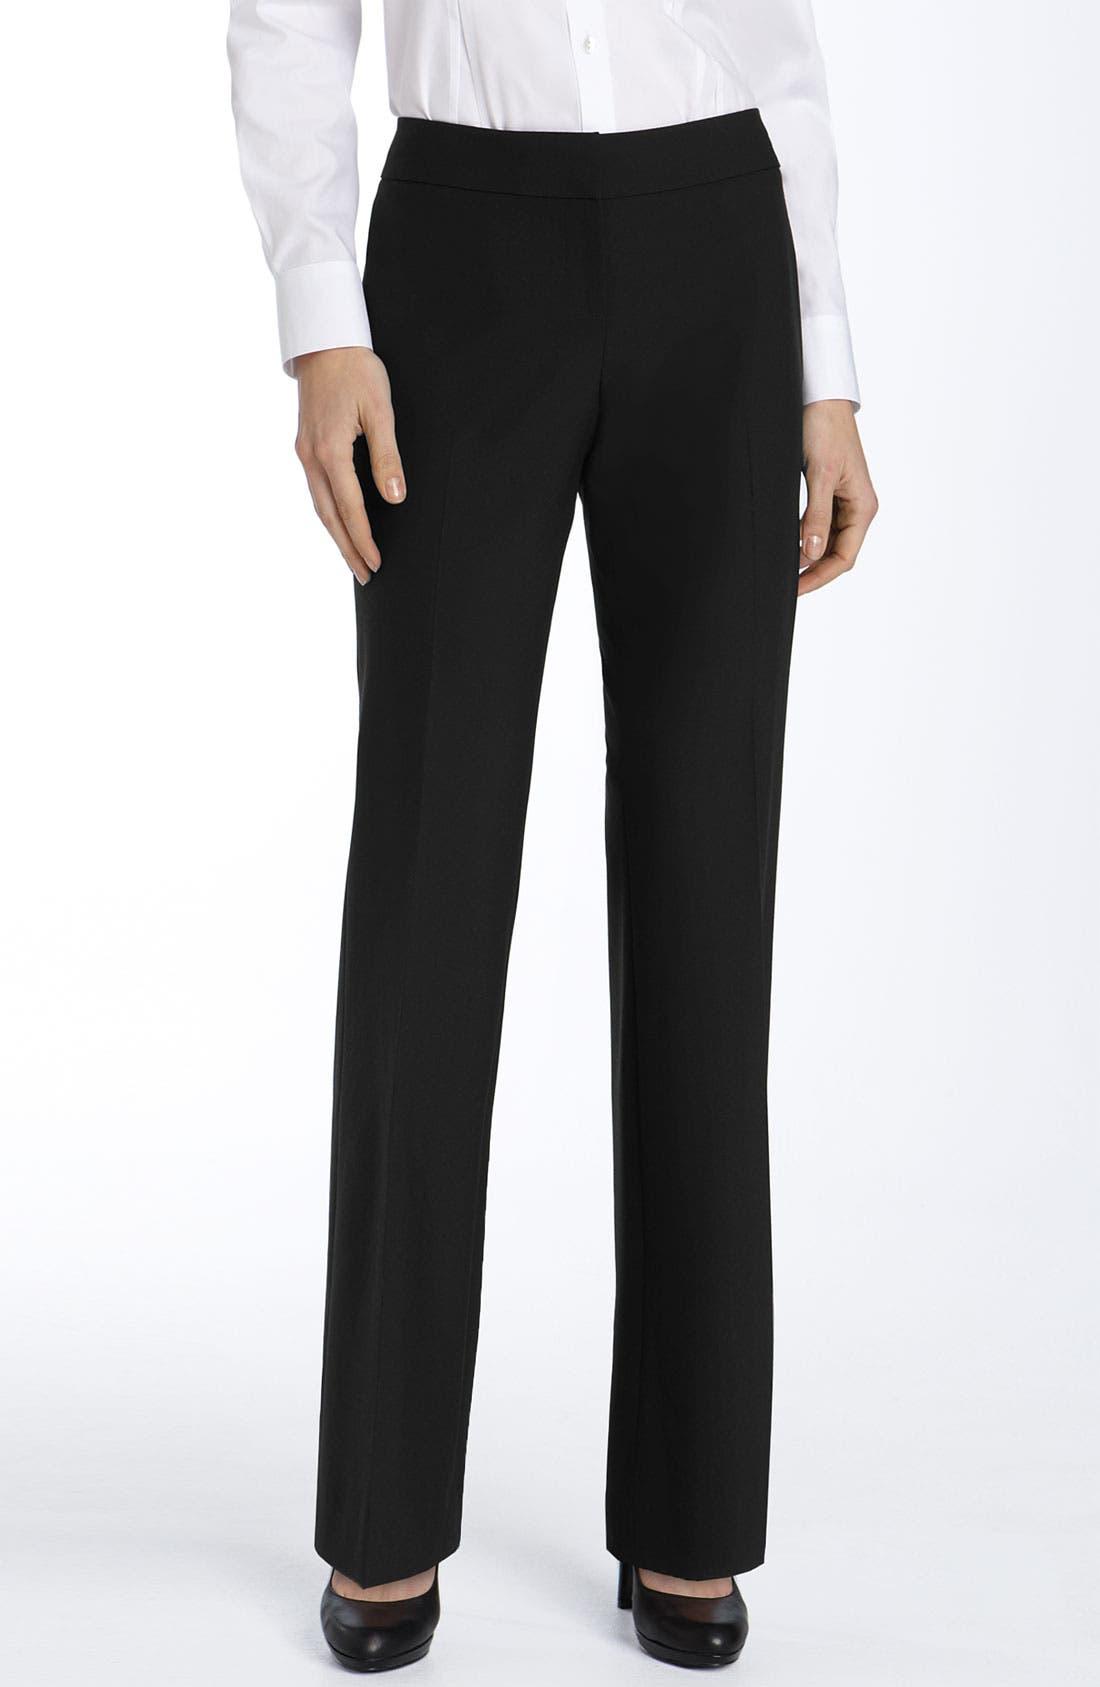 Alternate Image 1 Selected - Halogen® 'Taylor' Straight Leg Pants (Petite)